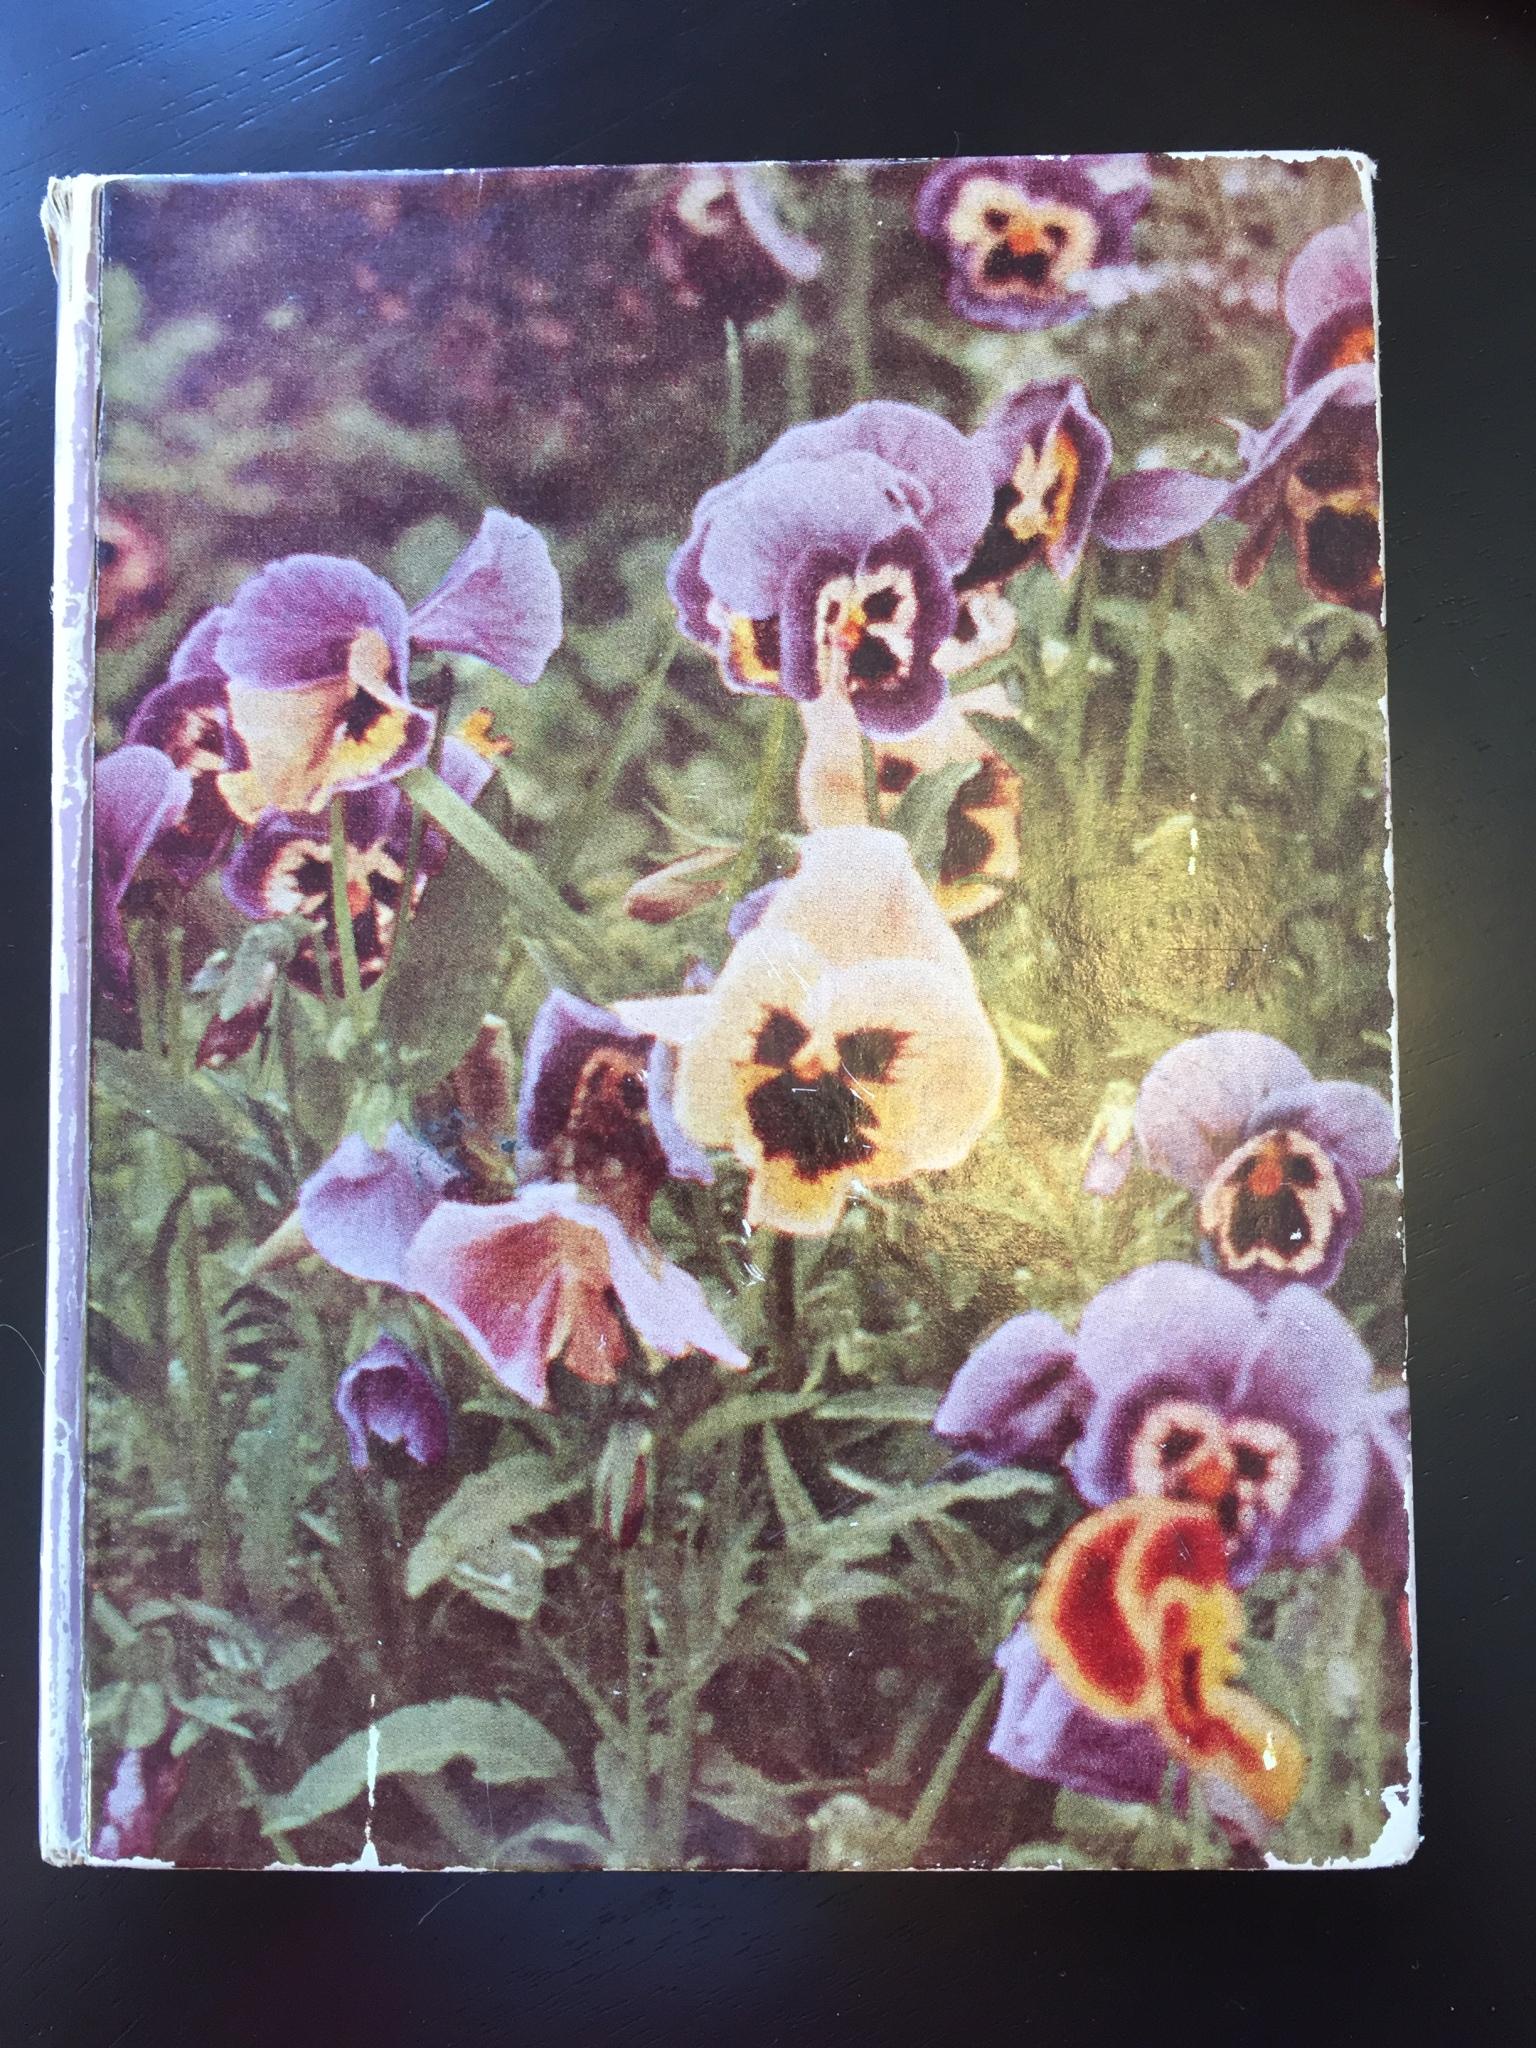 Off My Bookshelf blog post by Aspasia S. Bissas